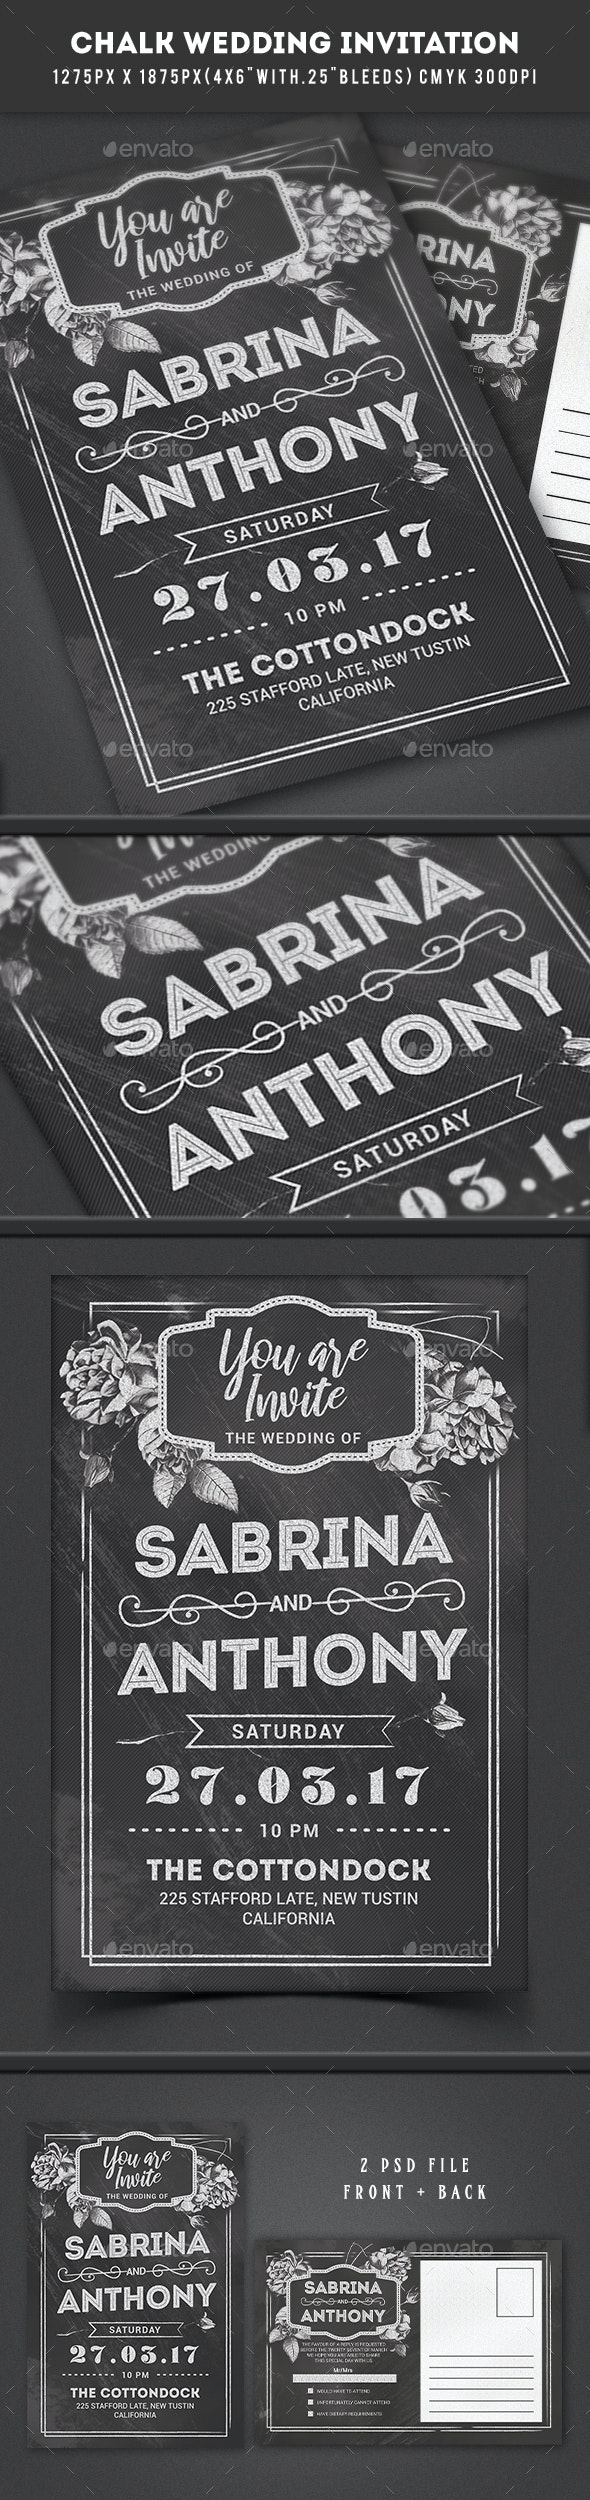 Chalkboard Wedding Invitation - Weddings Cards & Invites